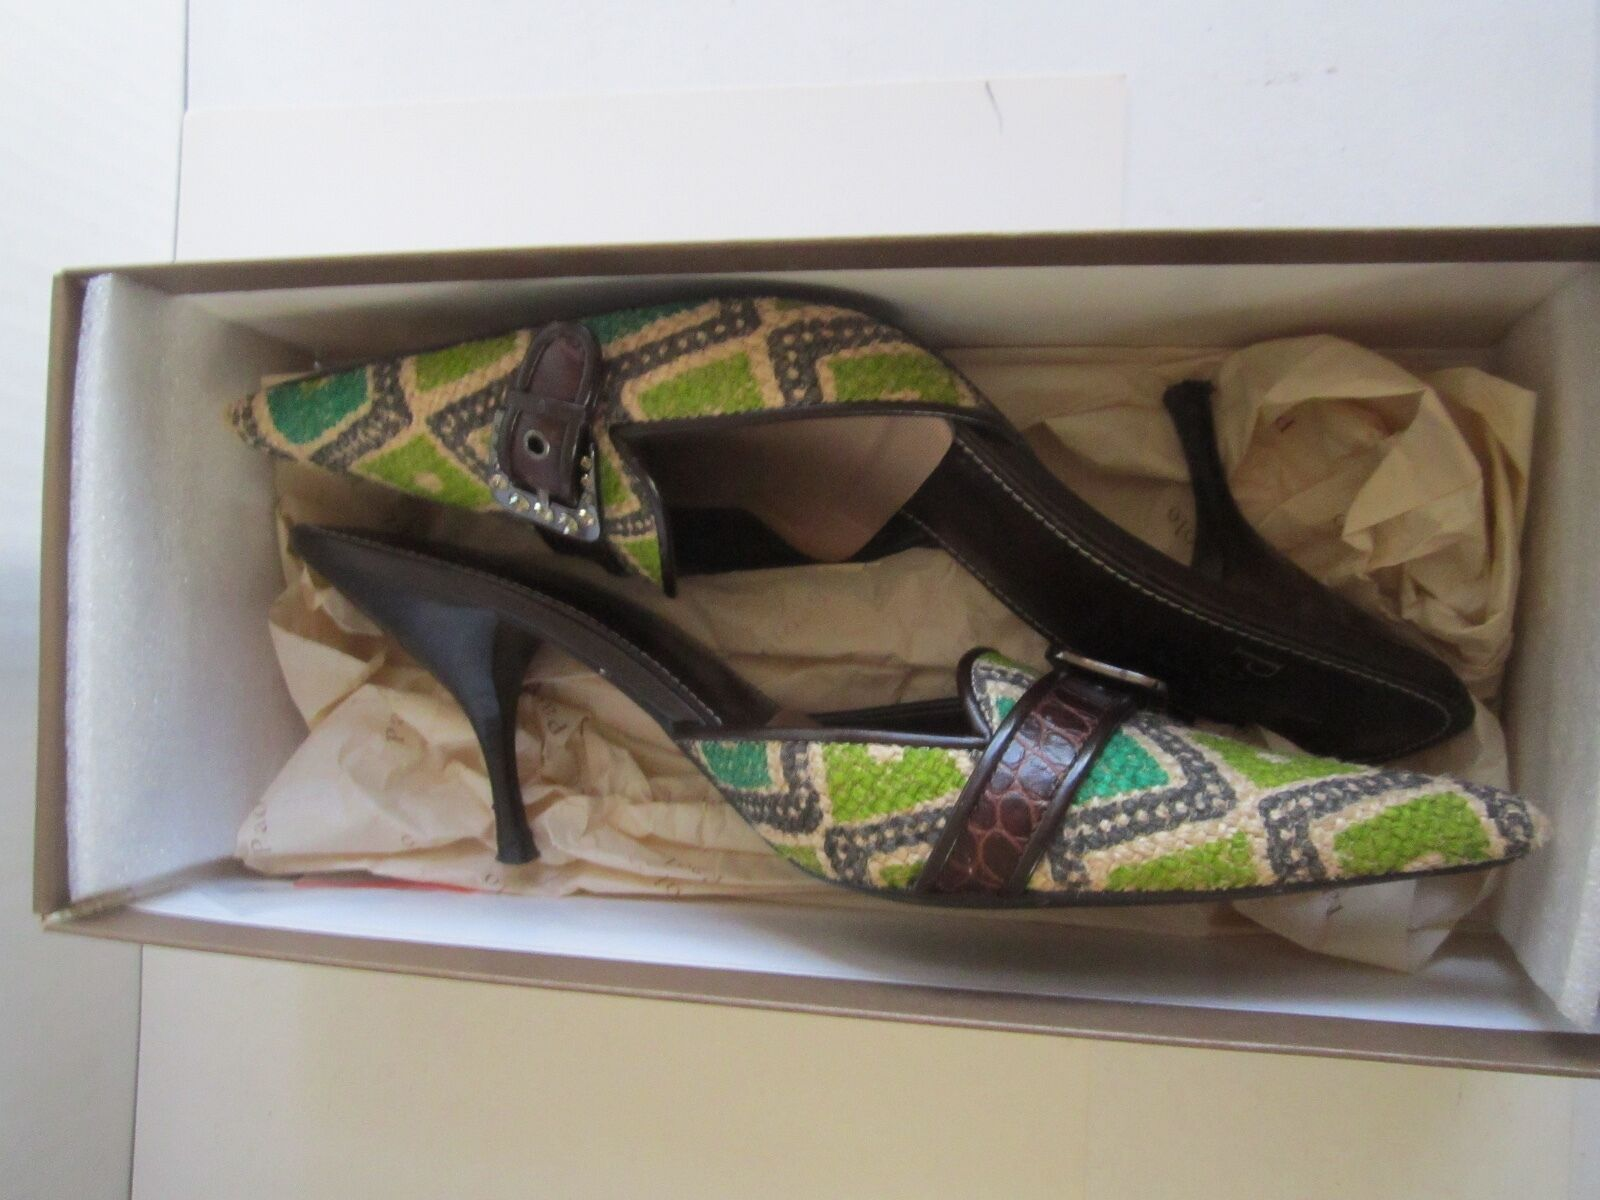 centro commerciale online integrato professionale LENEA PAOLO MULE POINTED scarpe - FABRIC WITH CRYSTAL CRYSTAL CRYSTAL BUCKLE - Dimensione 7 1 2 N  100% di contro garanzia genuina